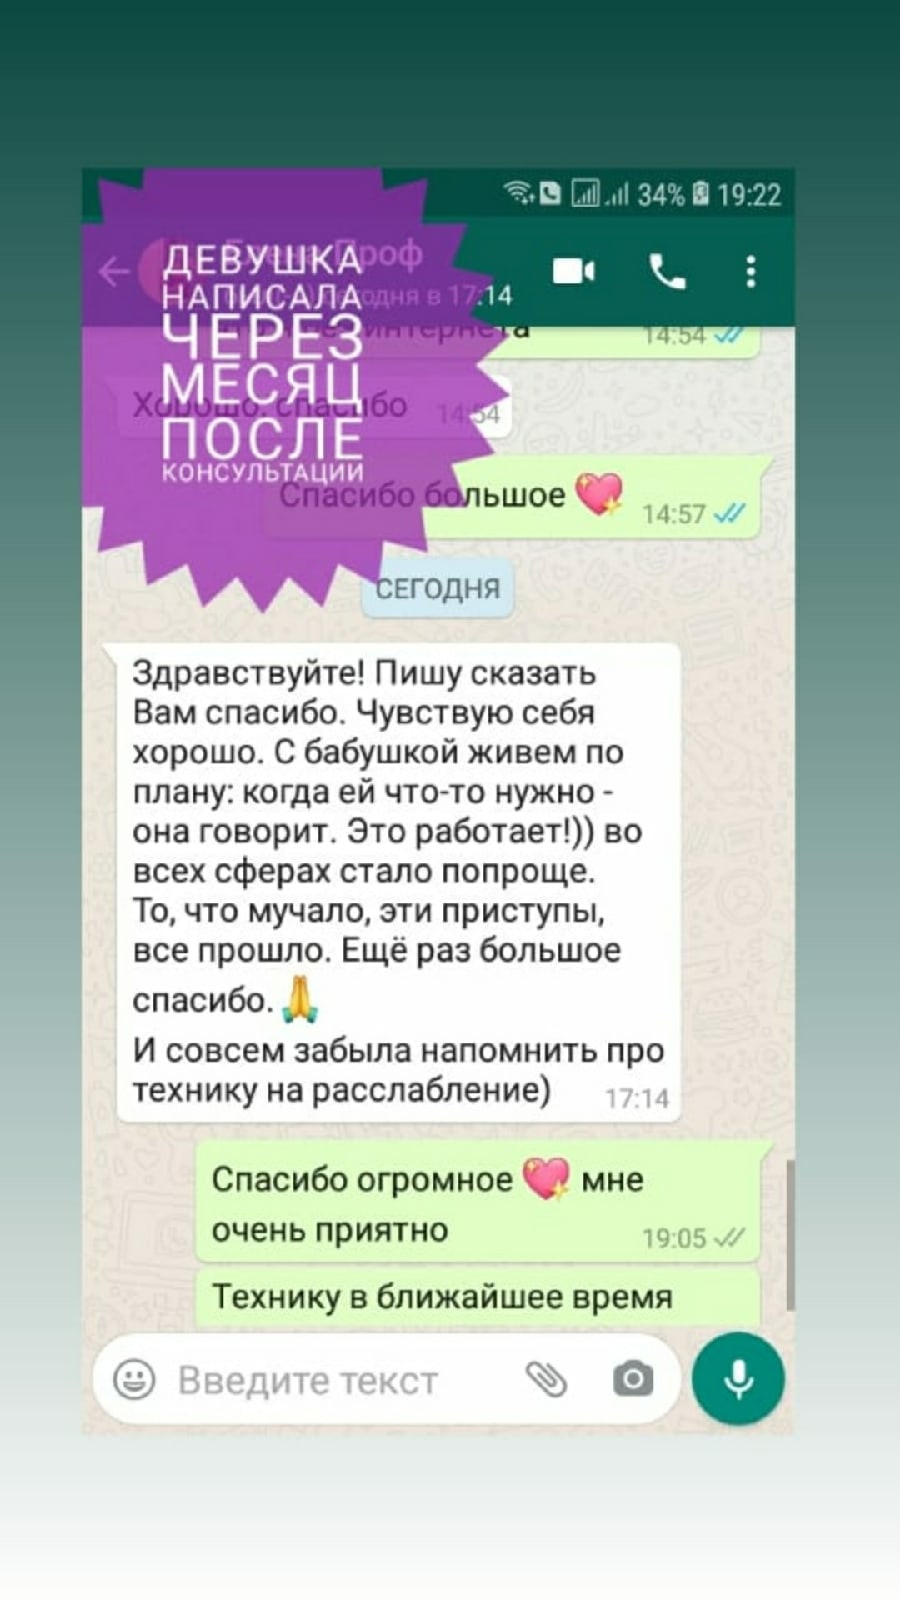 Z6kETeLCPvc - Отзывы Афанасьева Лилия